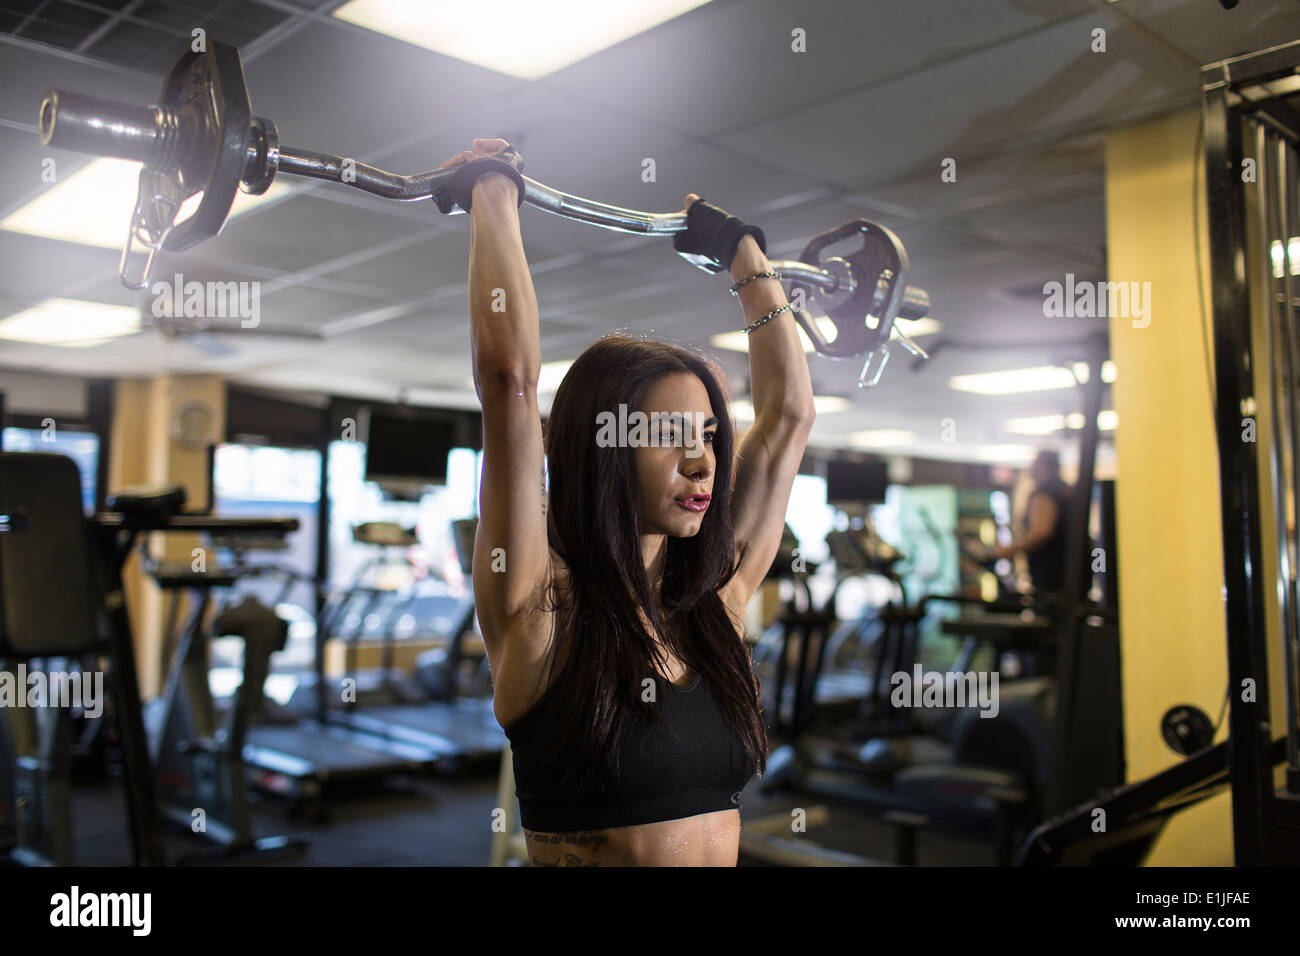 Mujer adulta media utilizando barbell en gimnasio Imagen De Stock